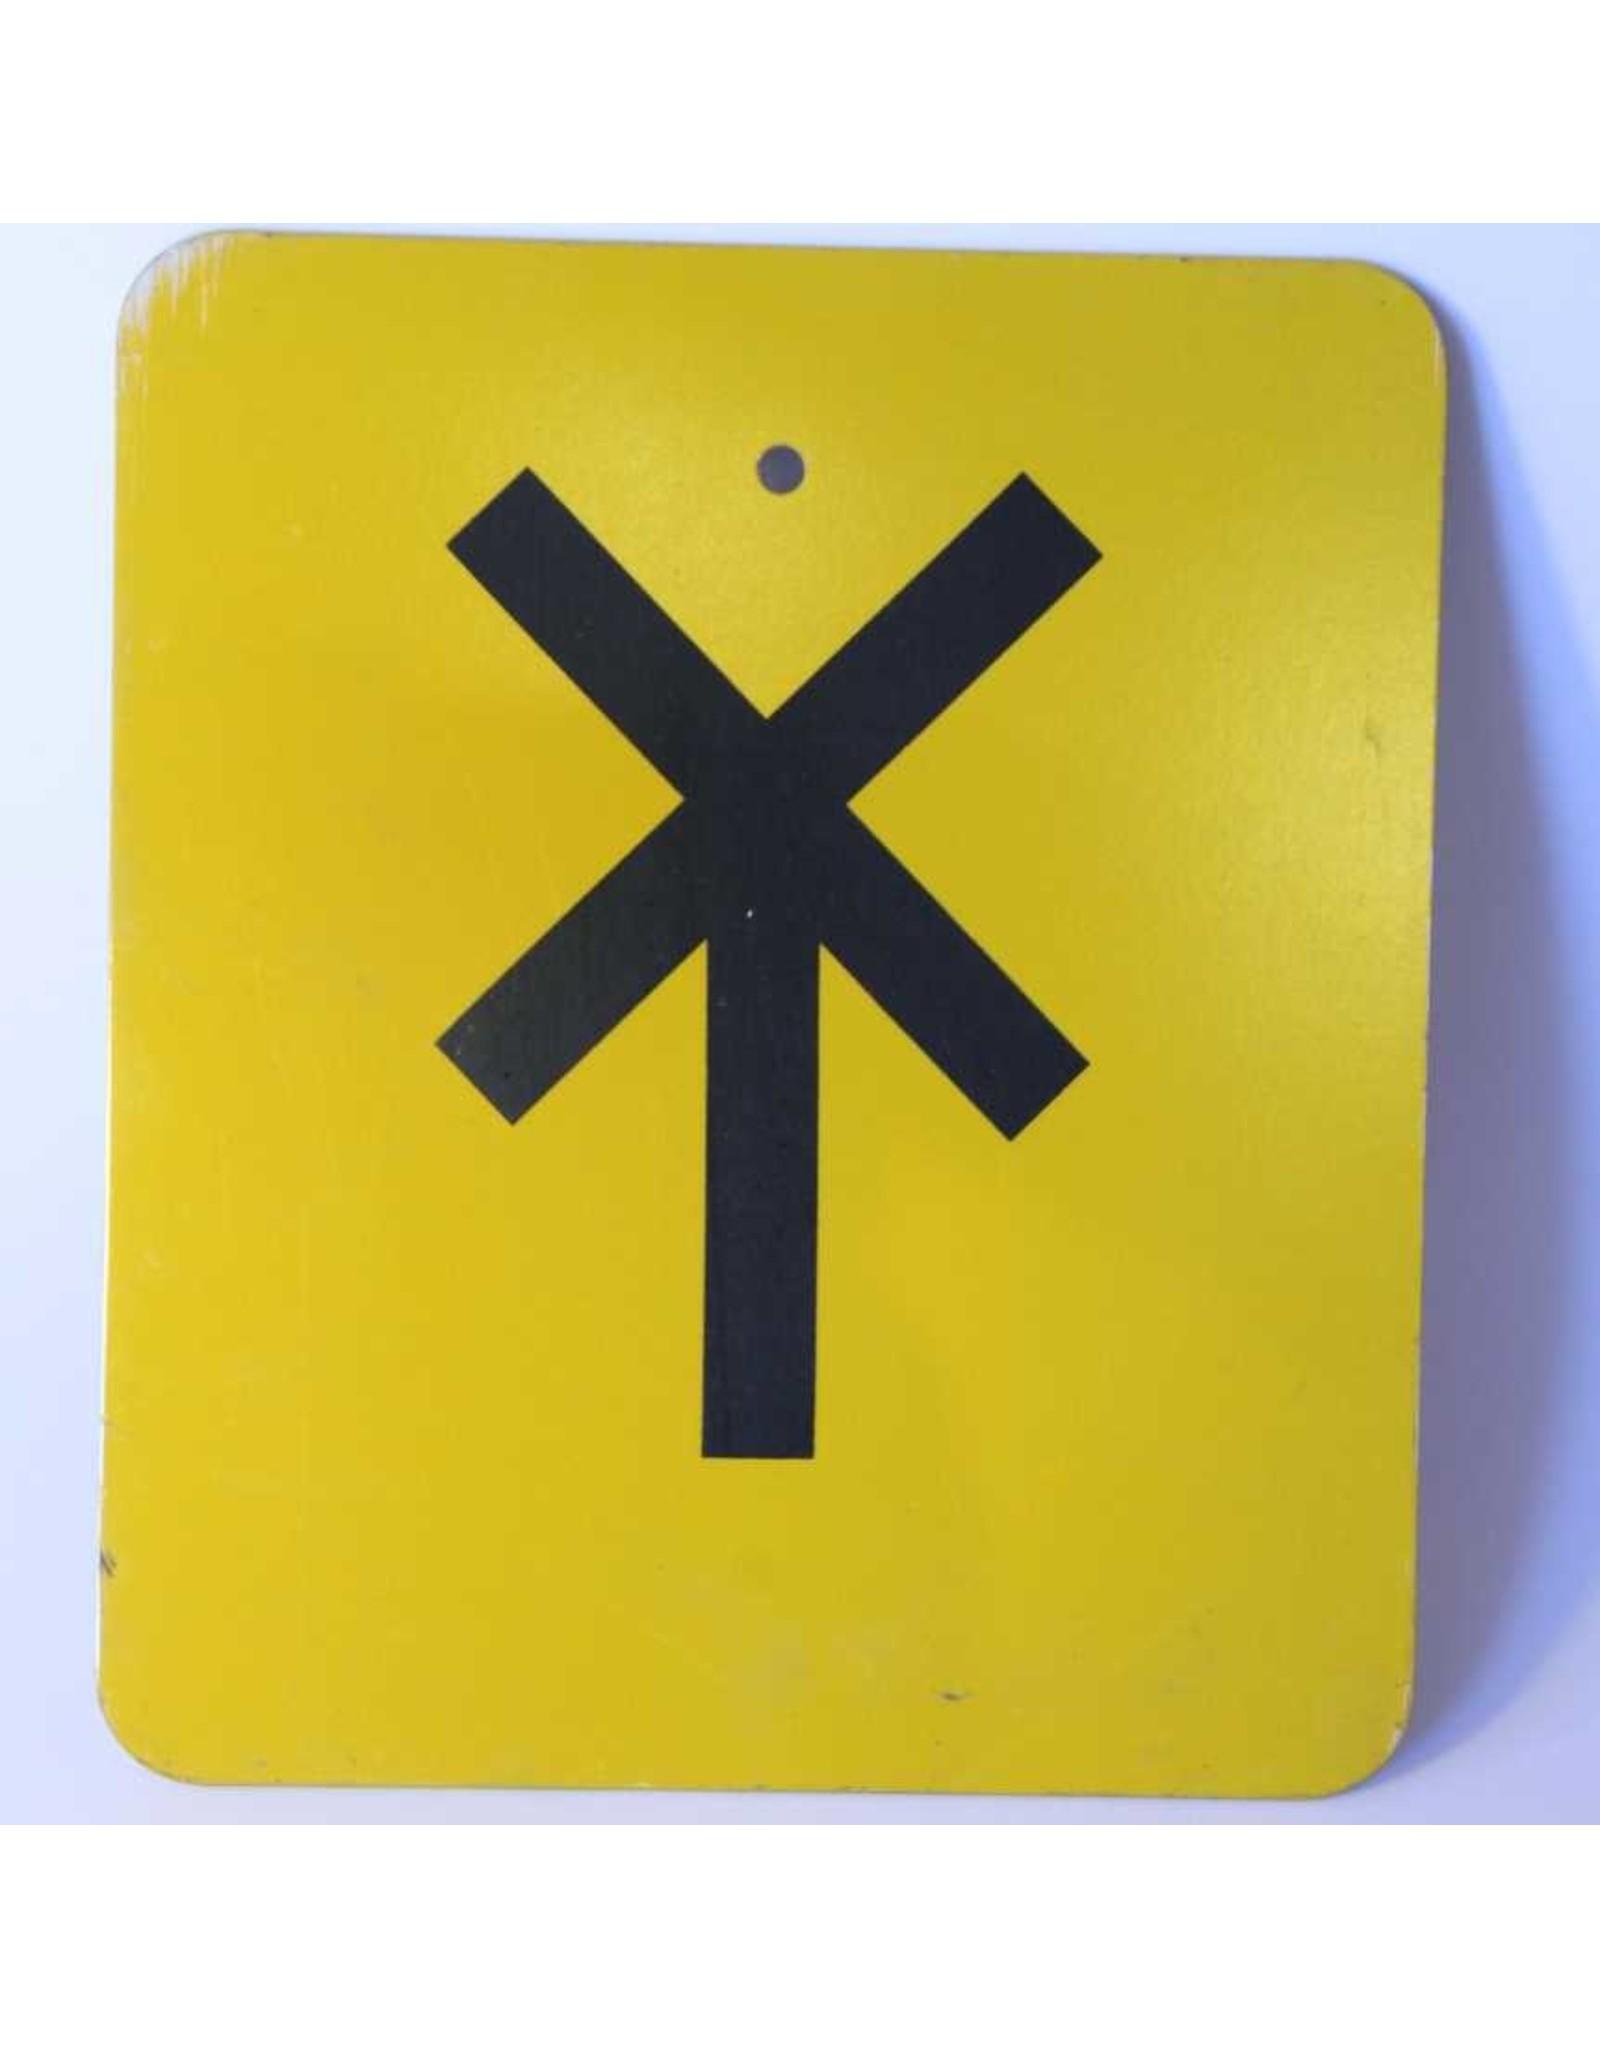 Street sign - cross, yellow, railway